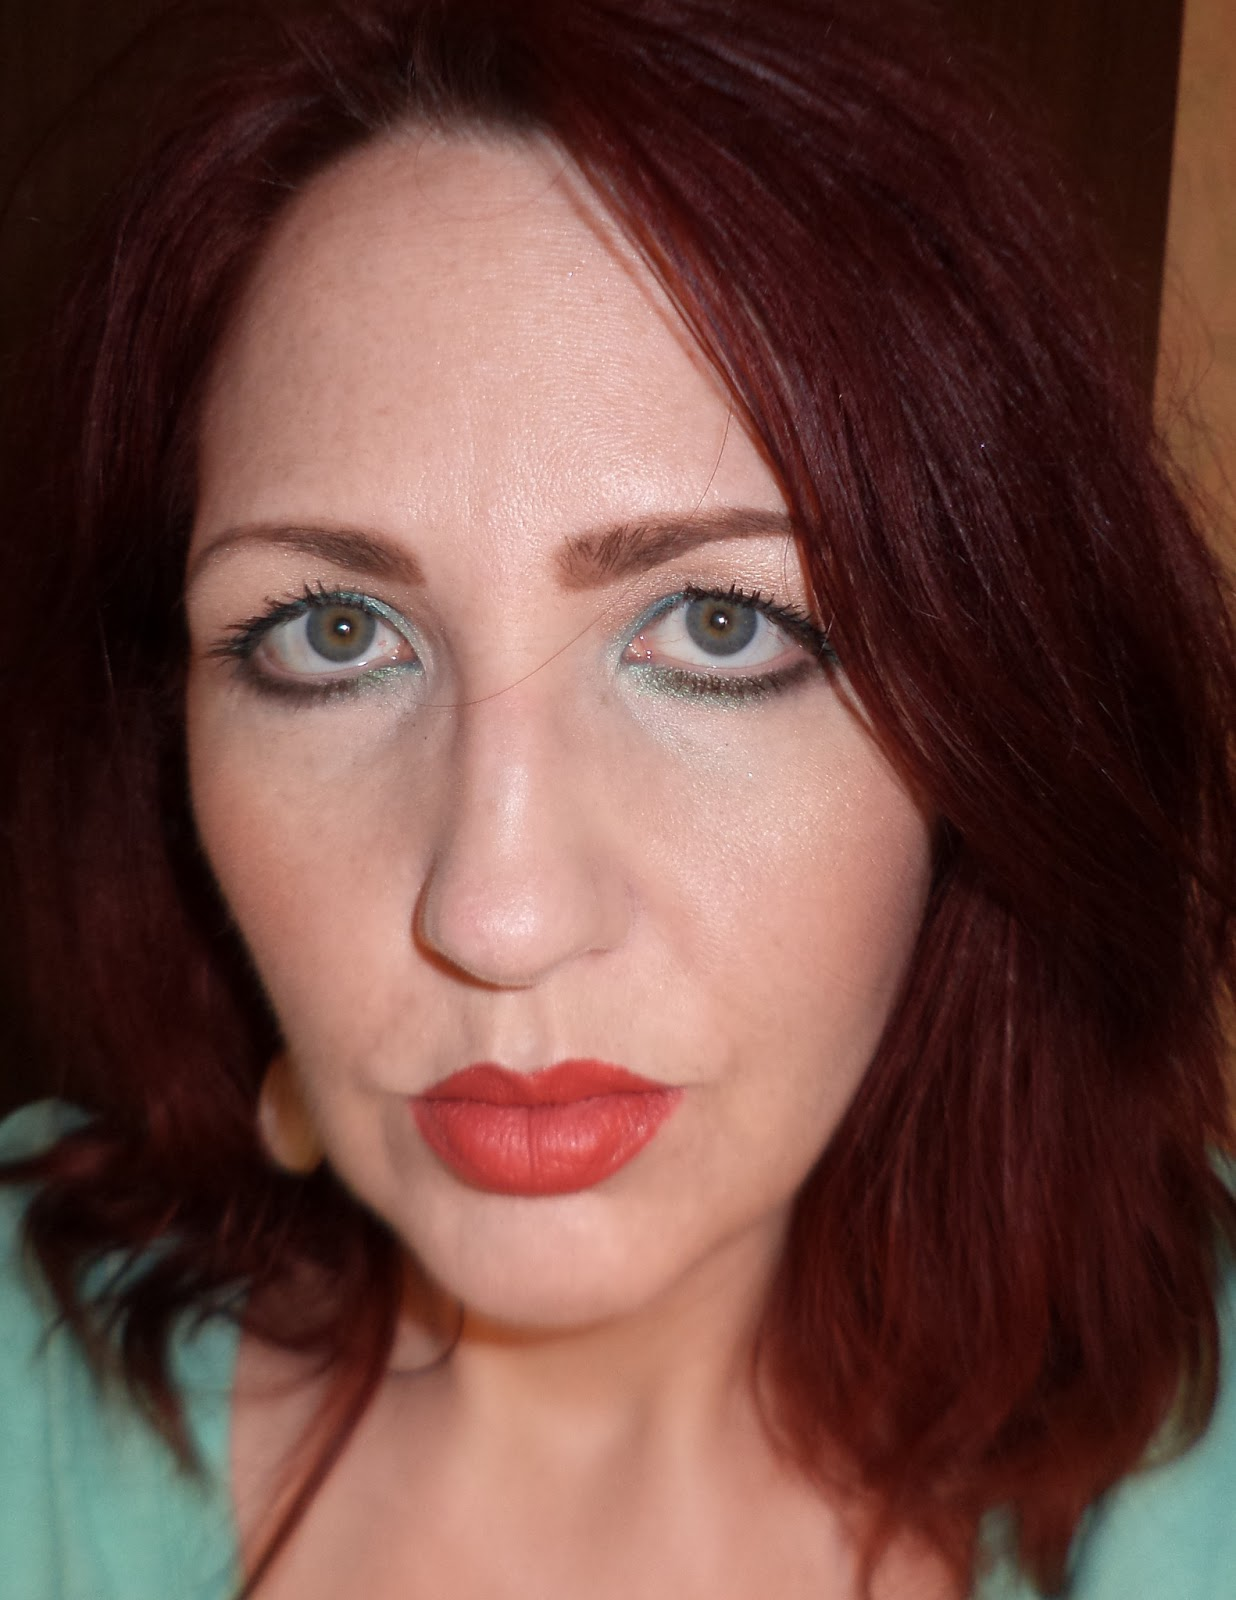 Makeup Junkie All About Mac Brushes Foundation: I Am THE Makeup Junkie: The Orange You Loving Orange Lips